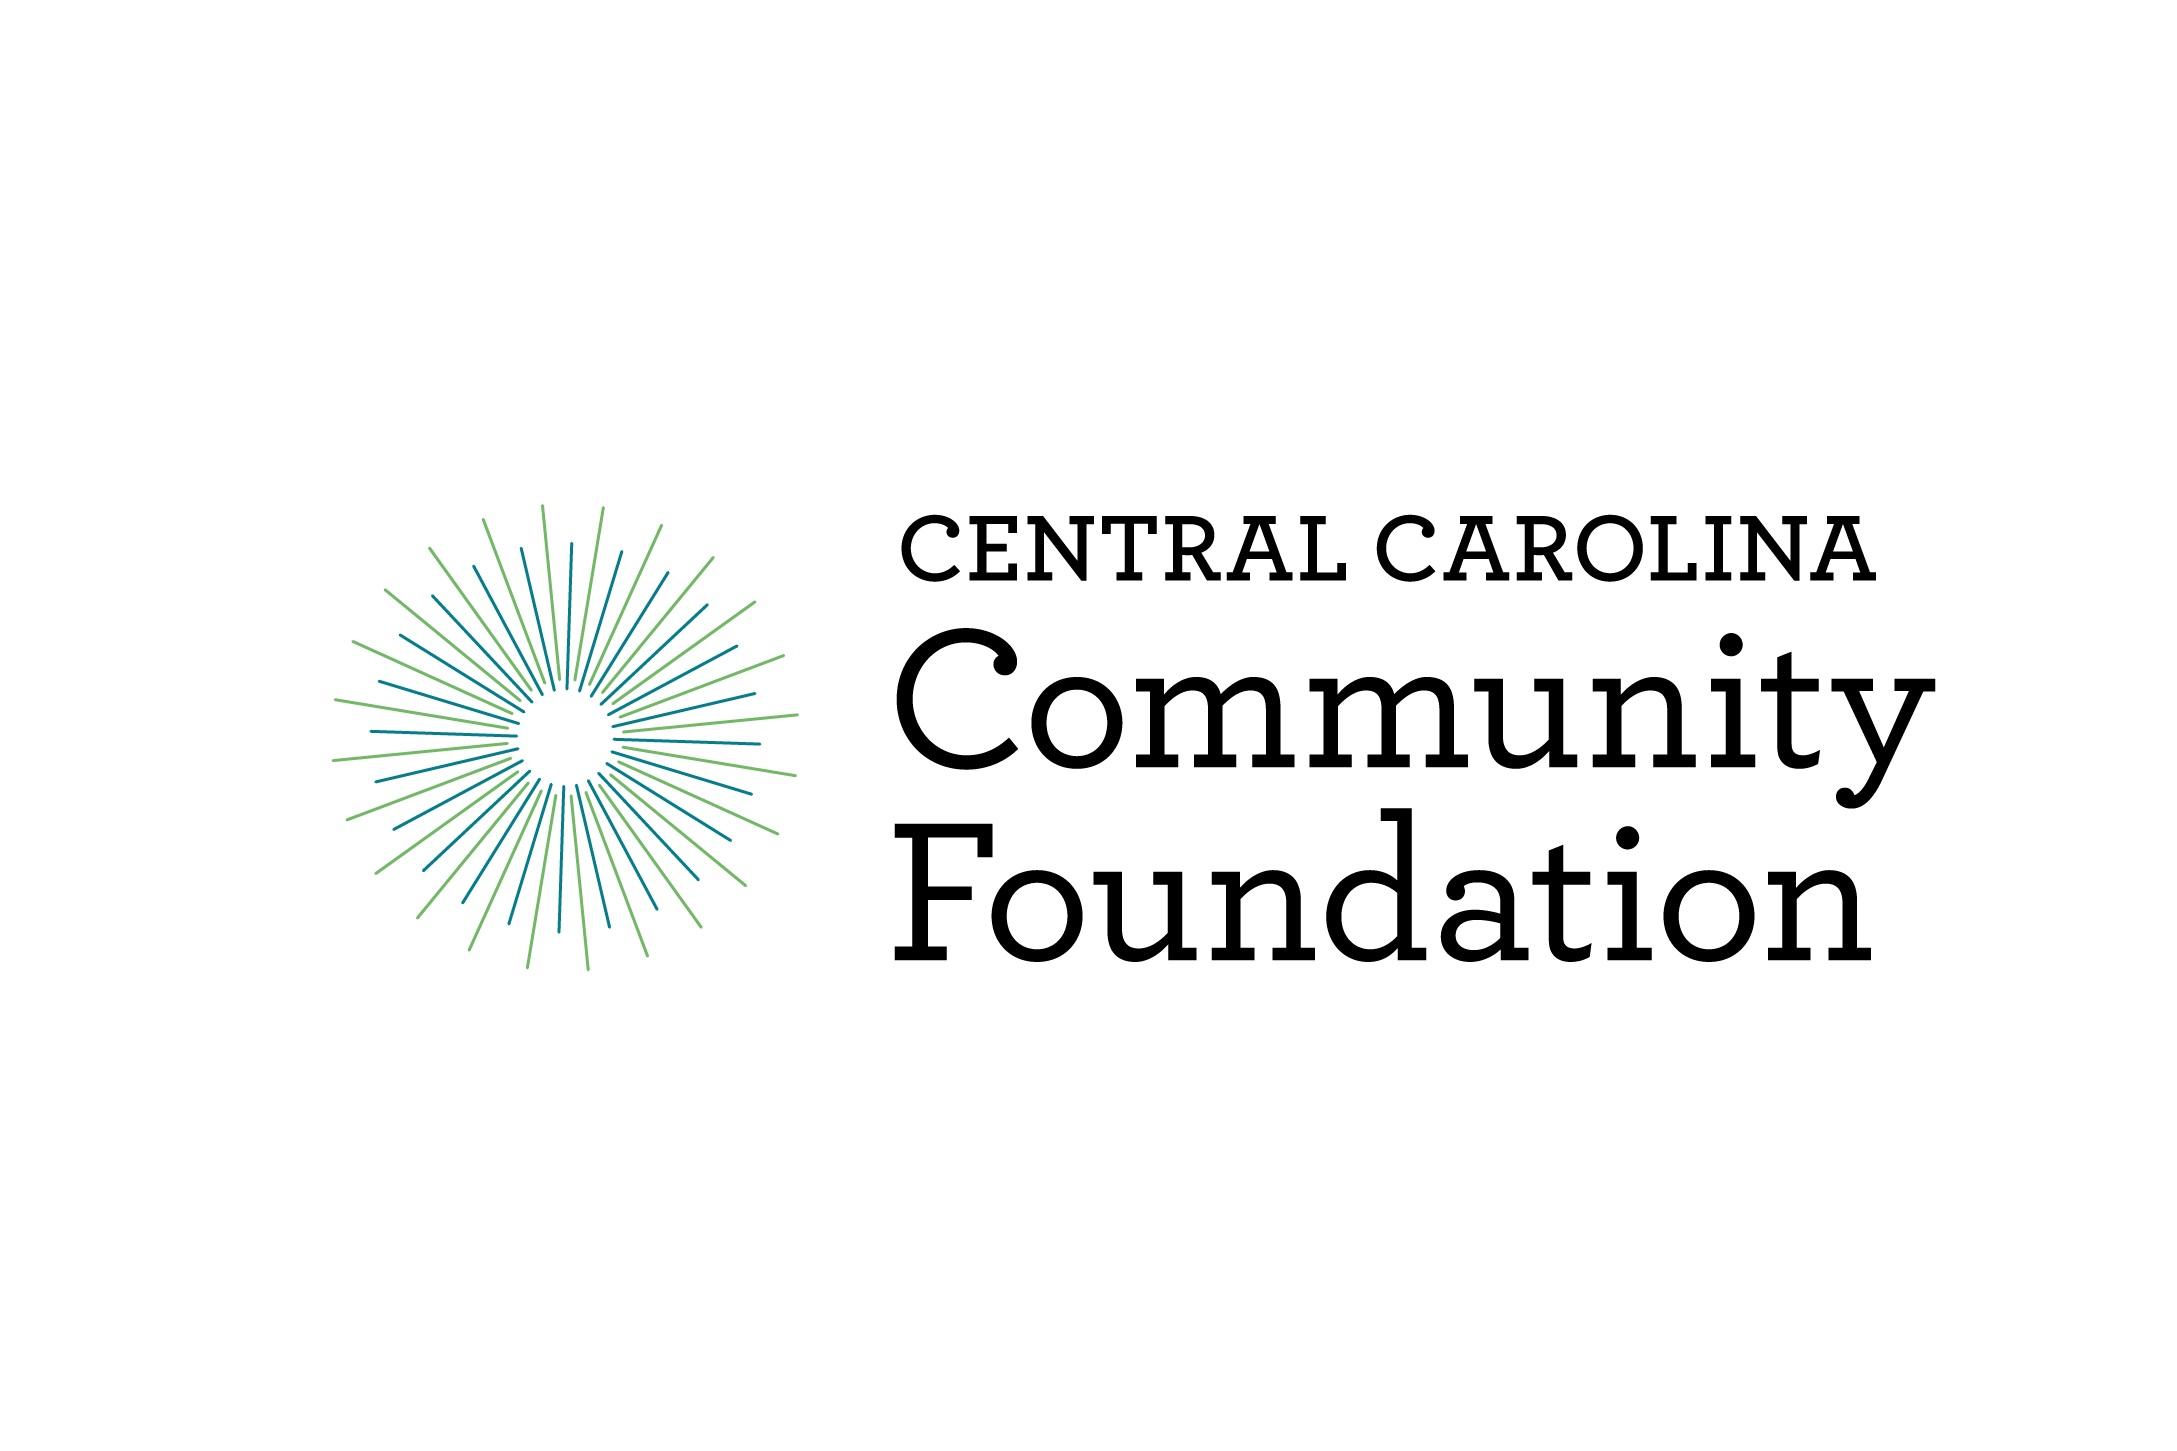 CCCF+Logo+2015+Final-01.jpg